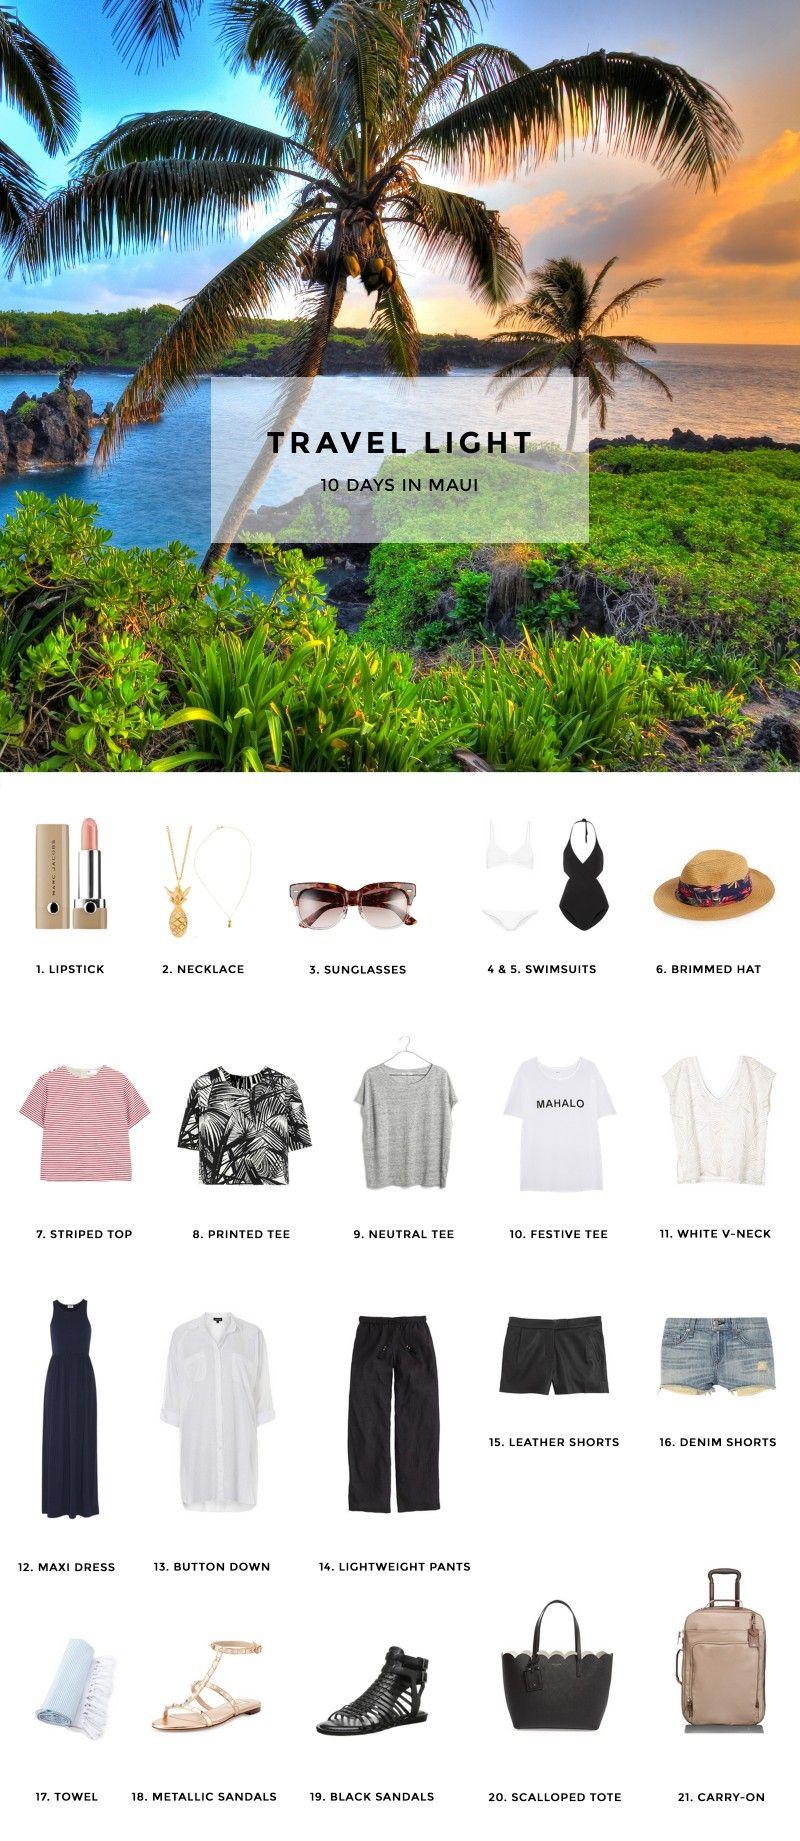 cb8a899558e Hawaii how to fold dress shirt for travel